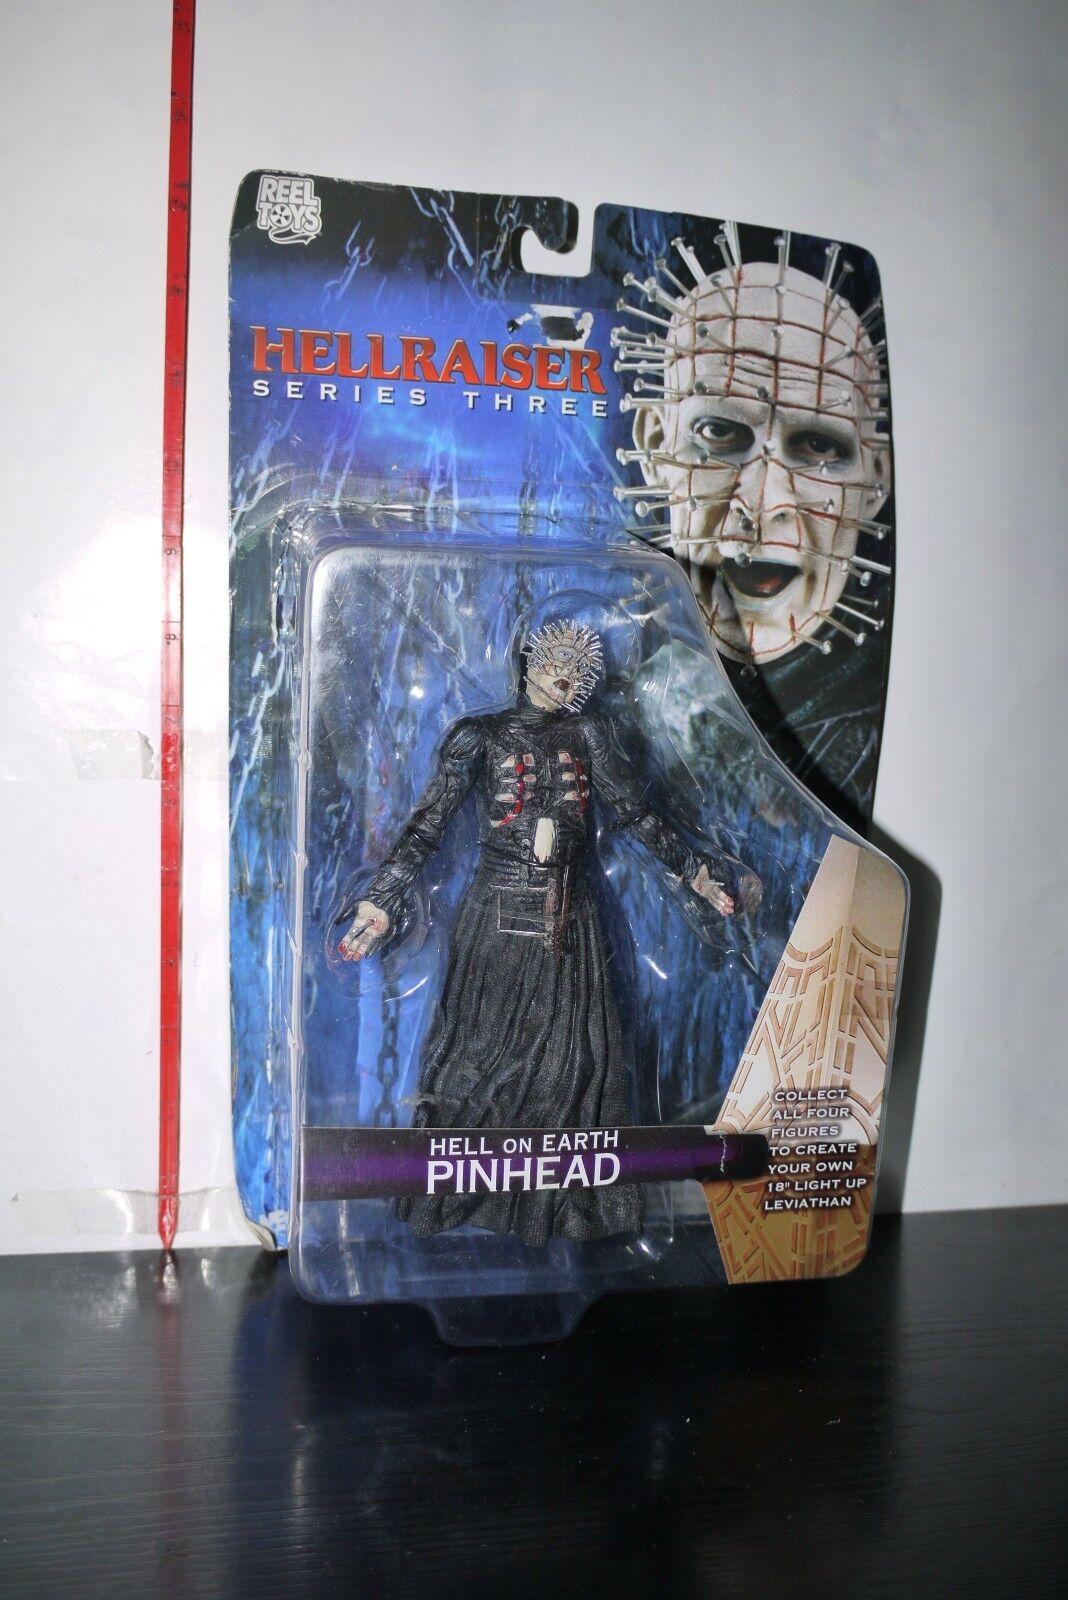 Reel Toys NECA 2004 Series 3 Hellraiser HELL ON EARTH PINHEAD Action Figure